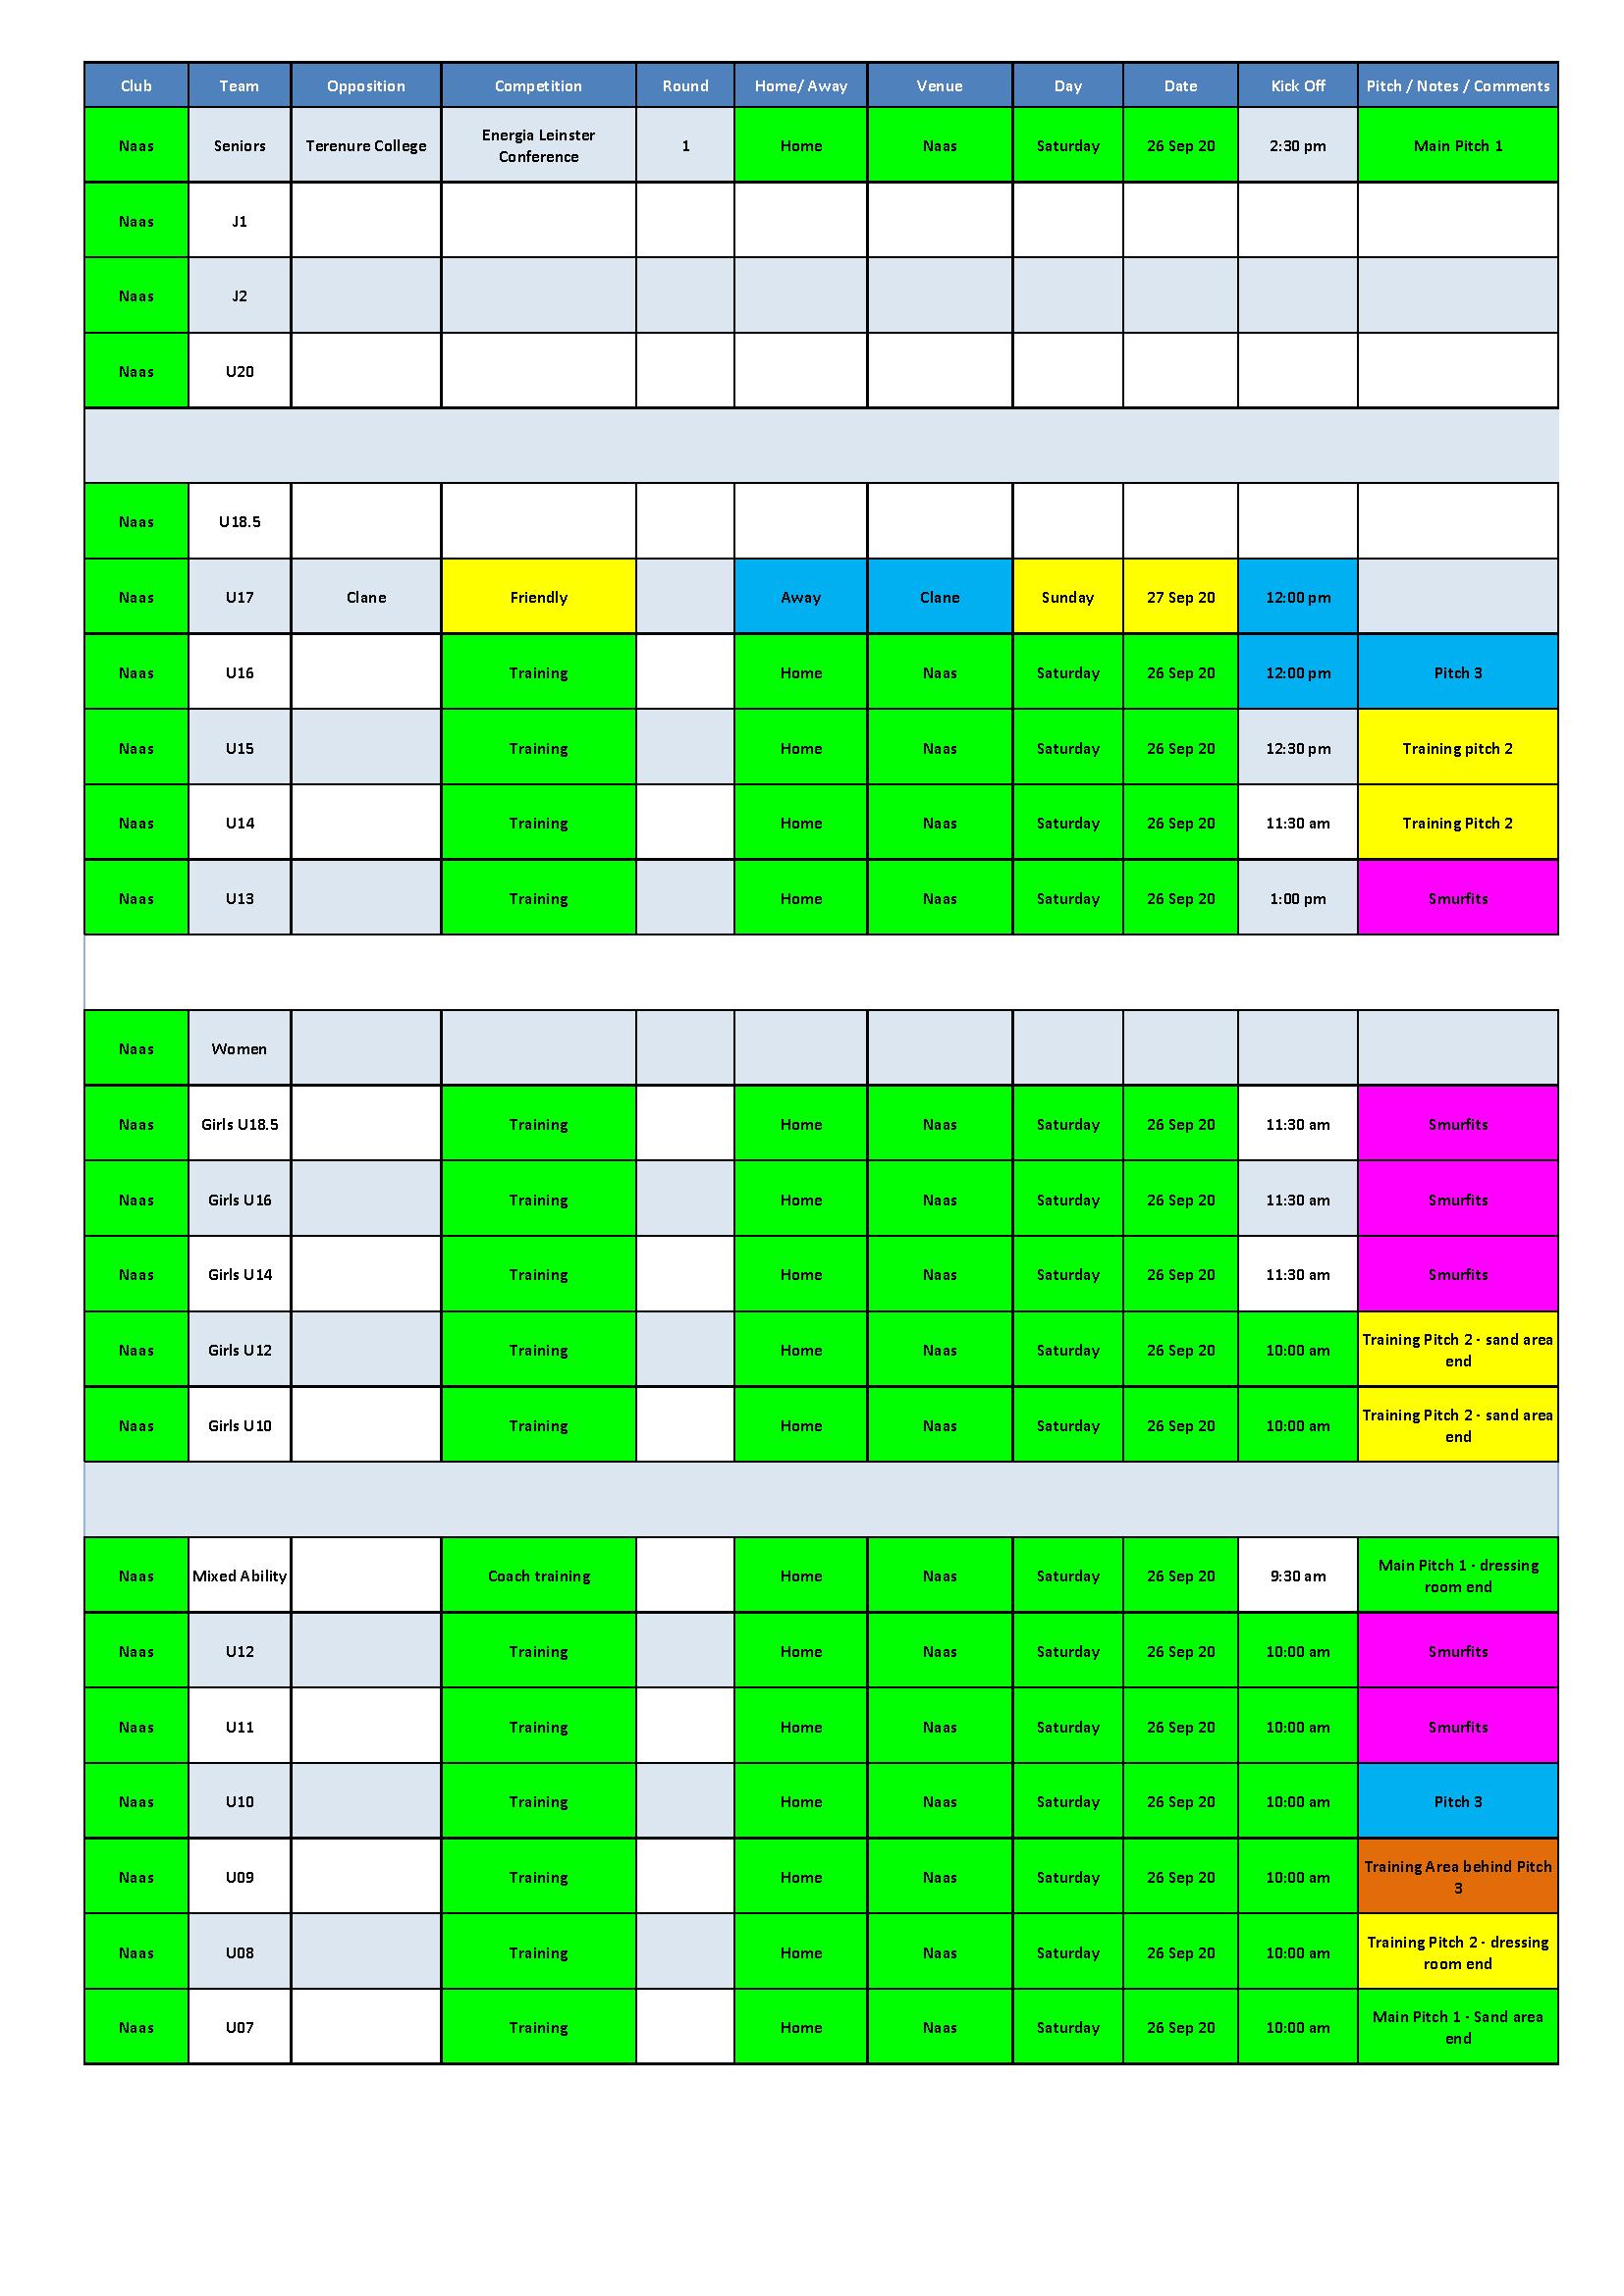 Naas 20rfc 20master 20fixtures 20w2 20final